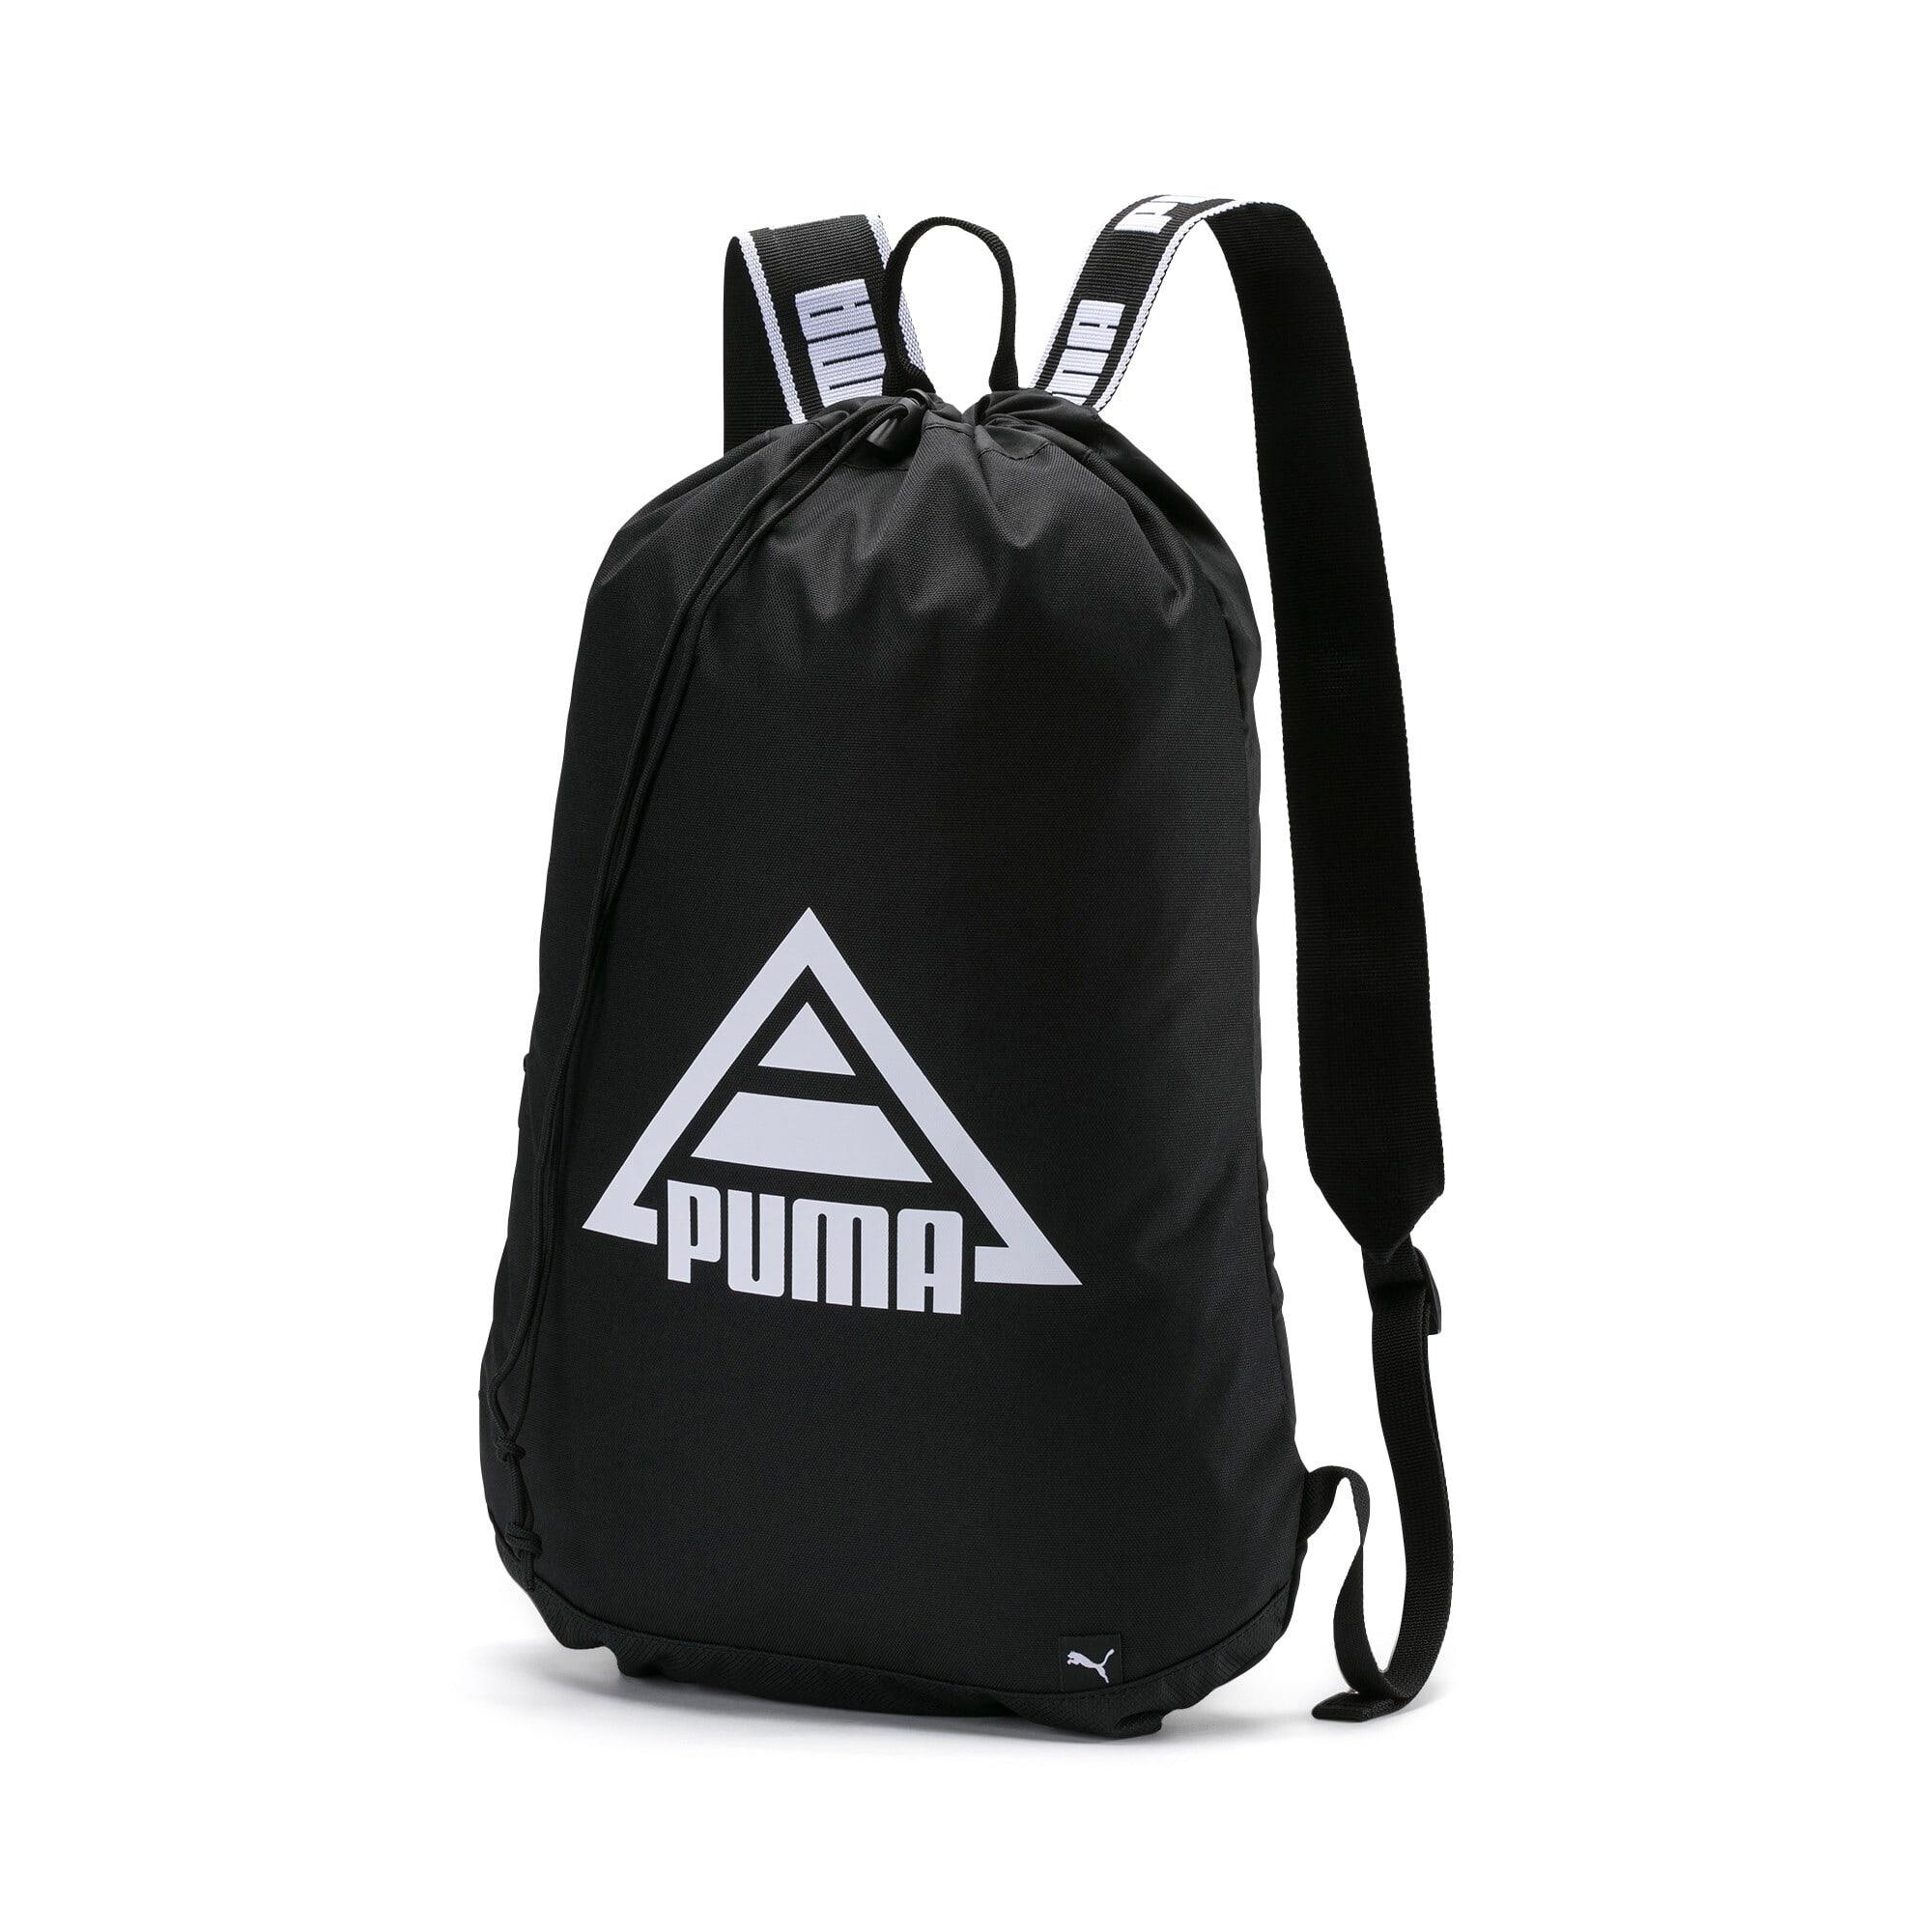 Thumbnail 1 of Sole Smart Bag, Puma Black, medium-IND